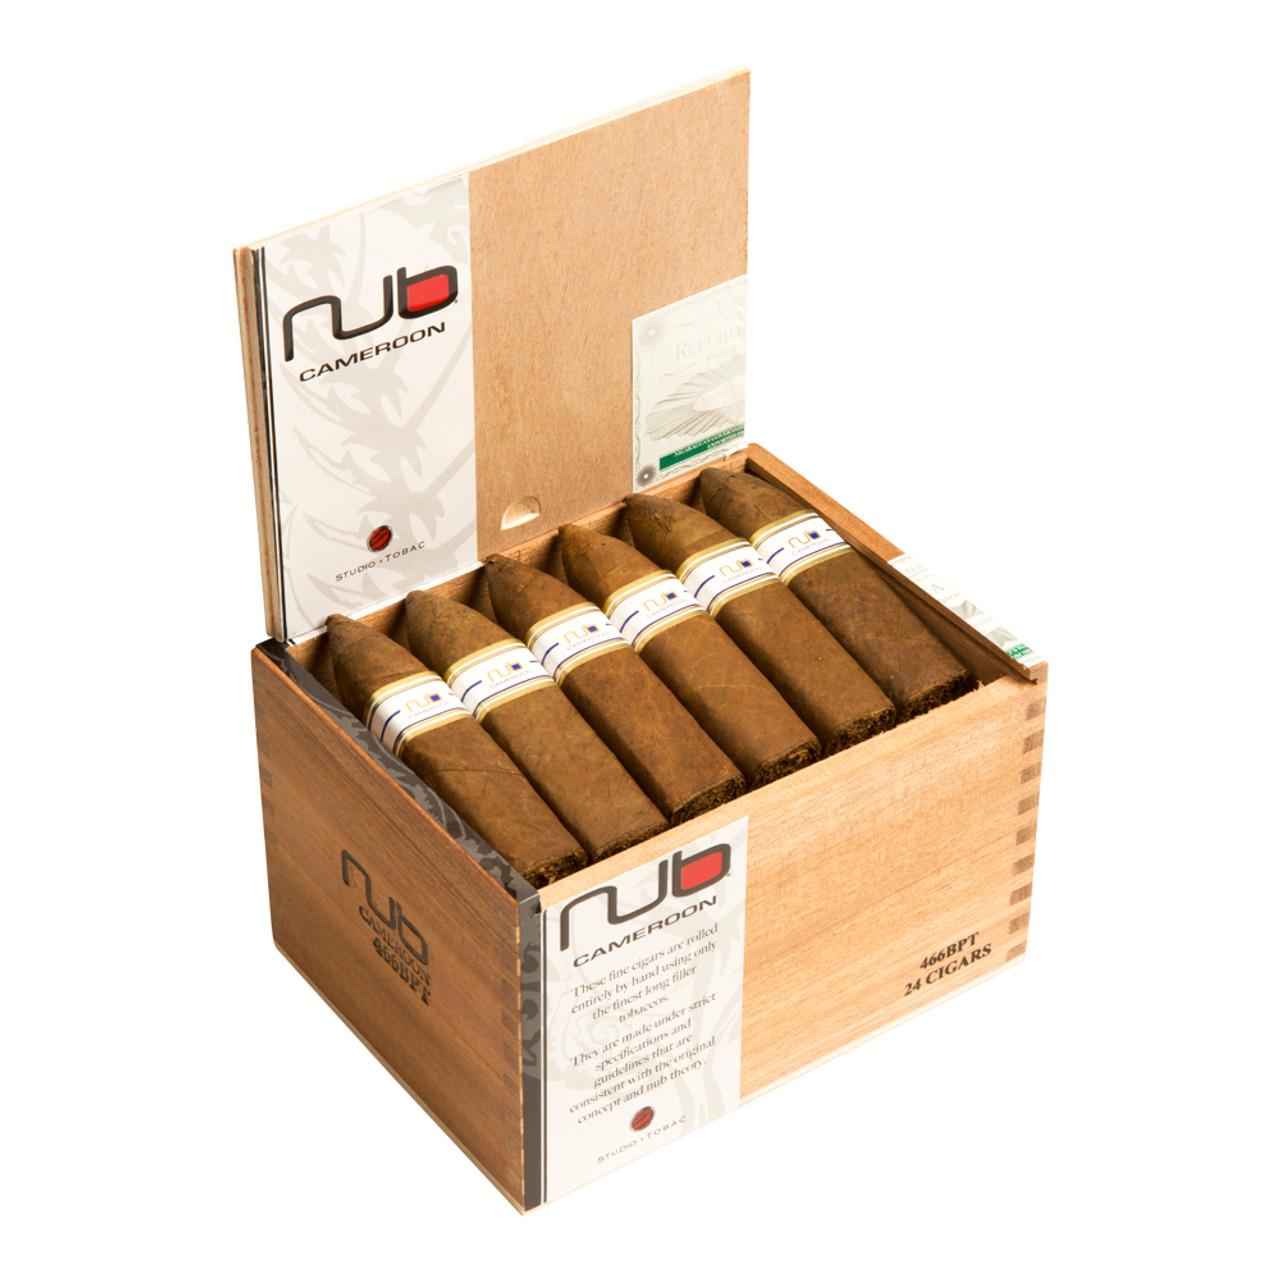 Nub 466 Cameroon BP Torpedo Cigars - 4 x 466 (Box of 24)